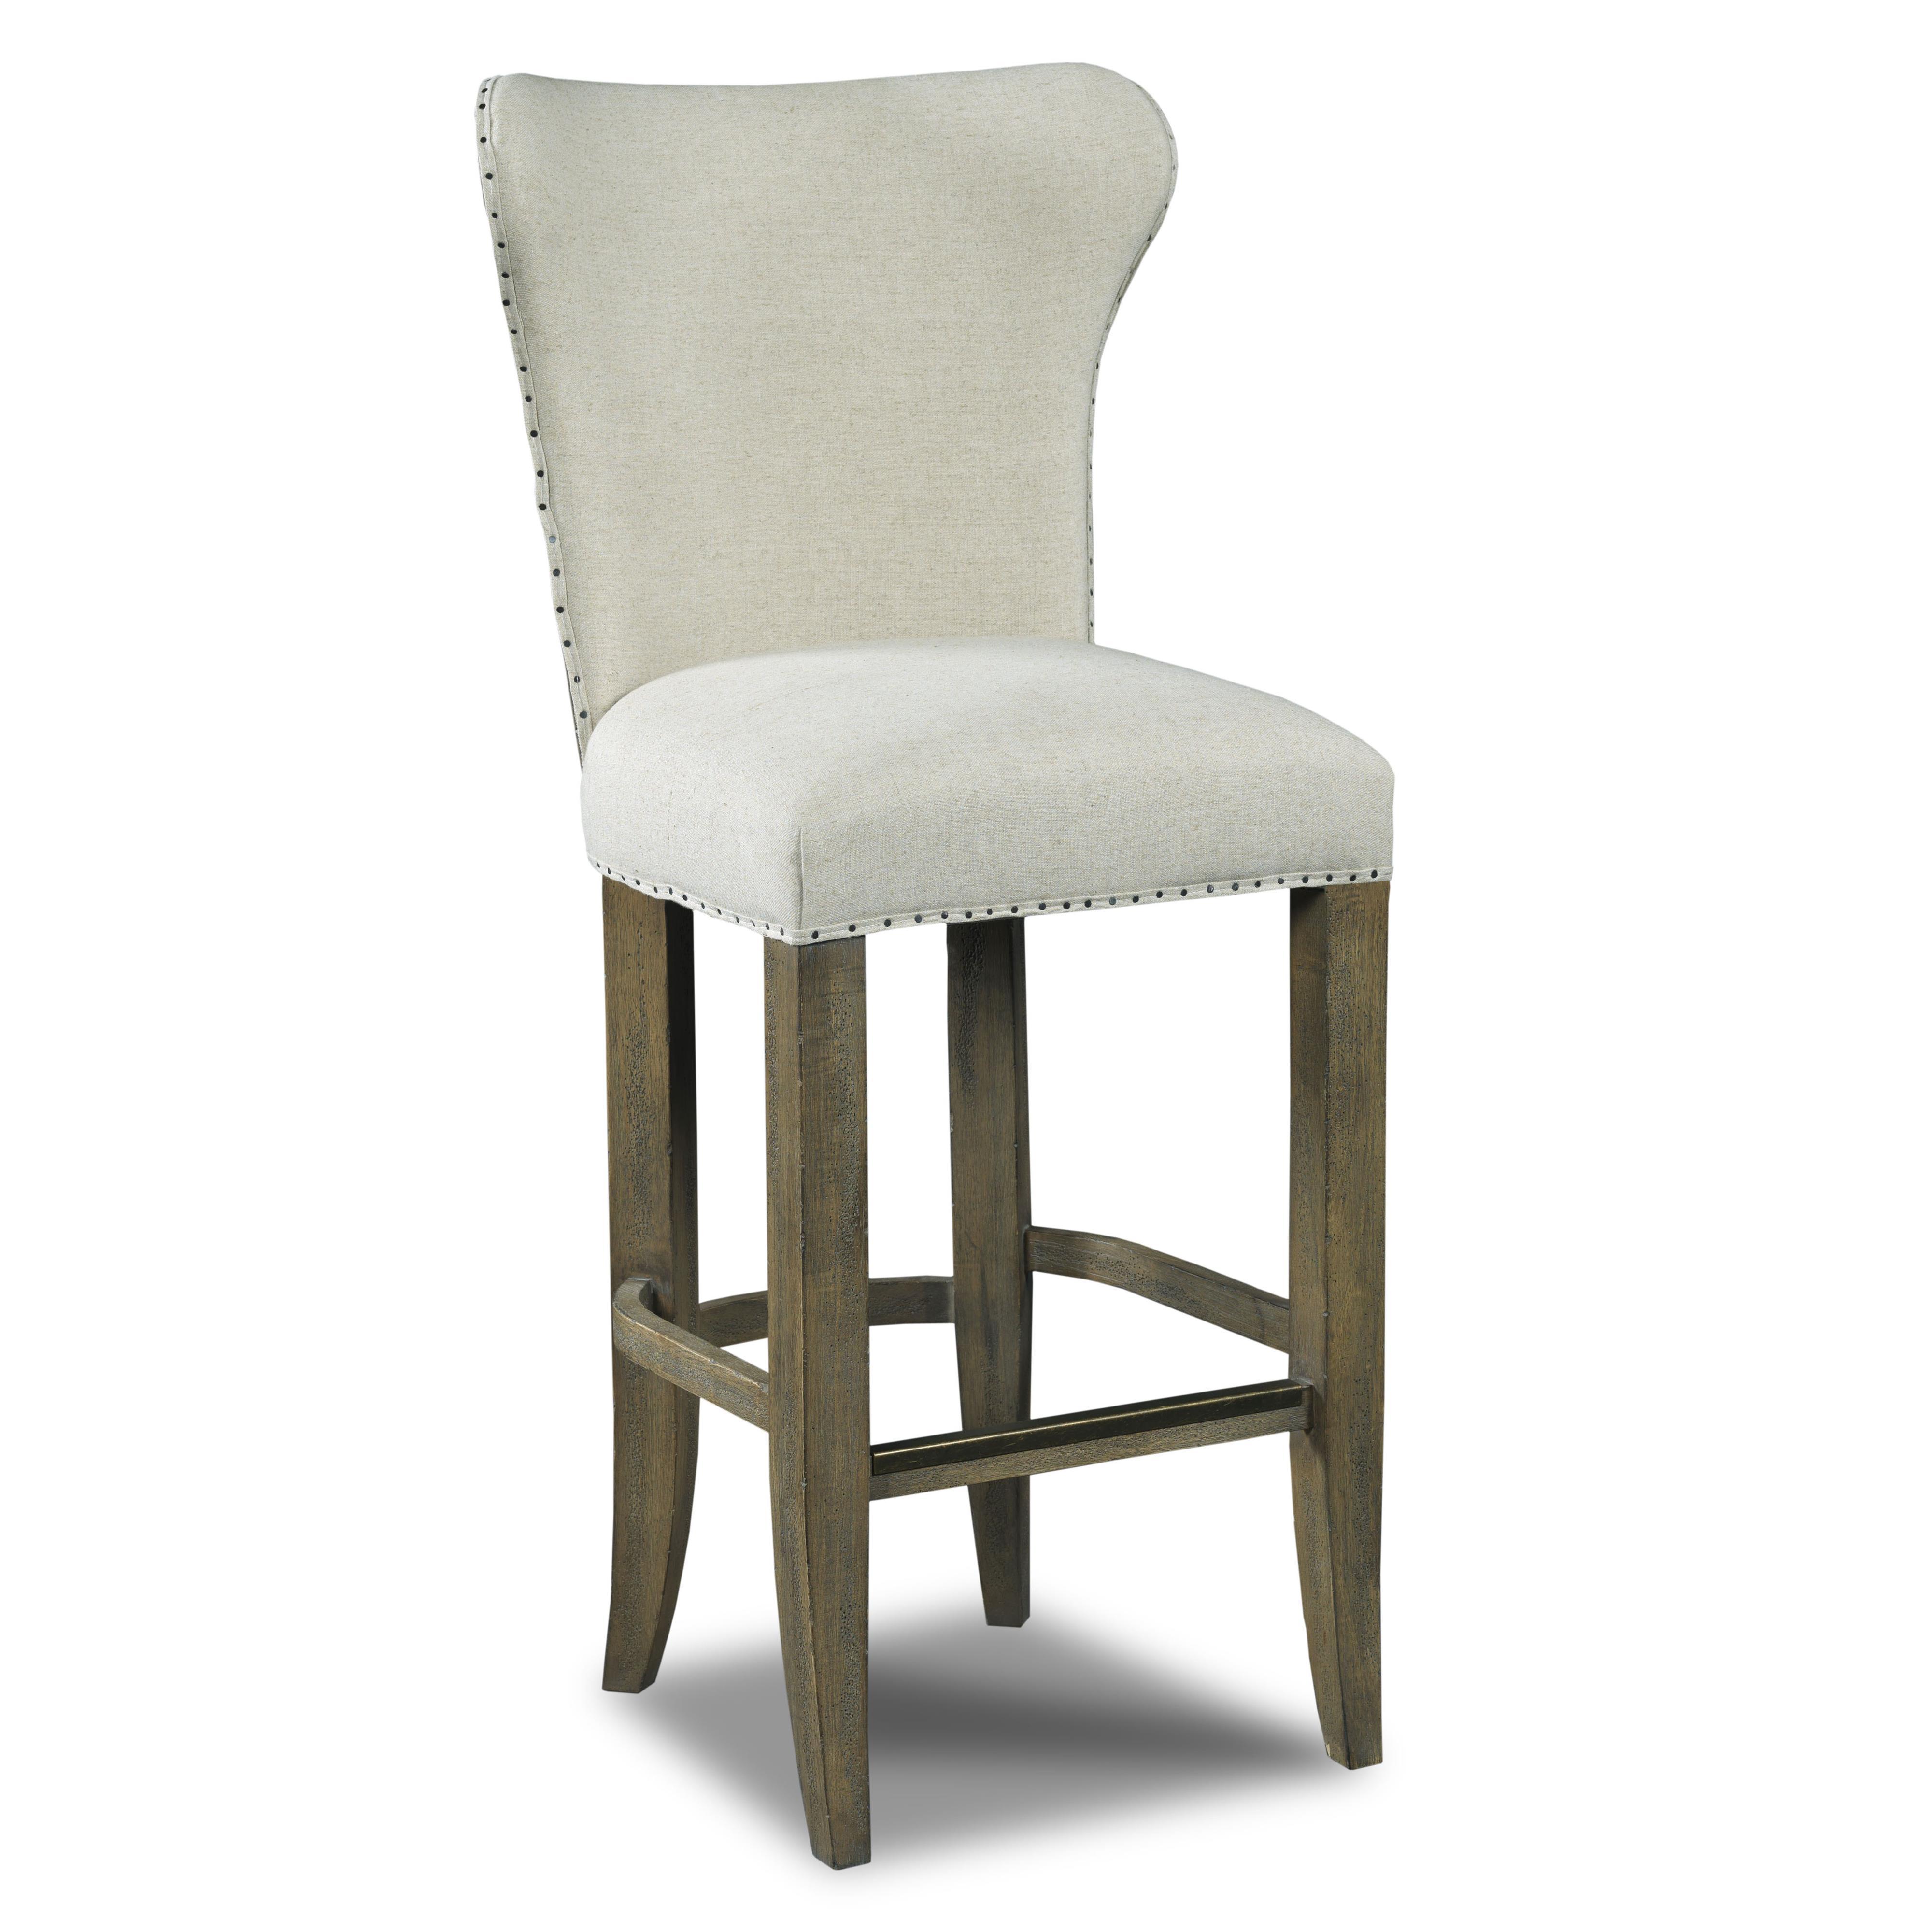 Hooker Furniture Stools Light Rum Runner Deconstructed Barstool - Item Number: 300-20009